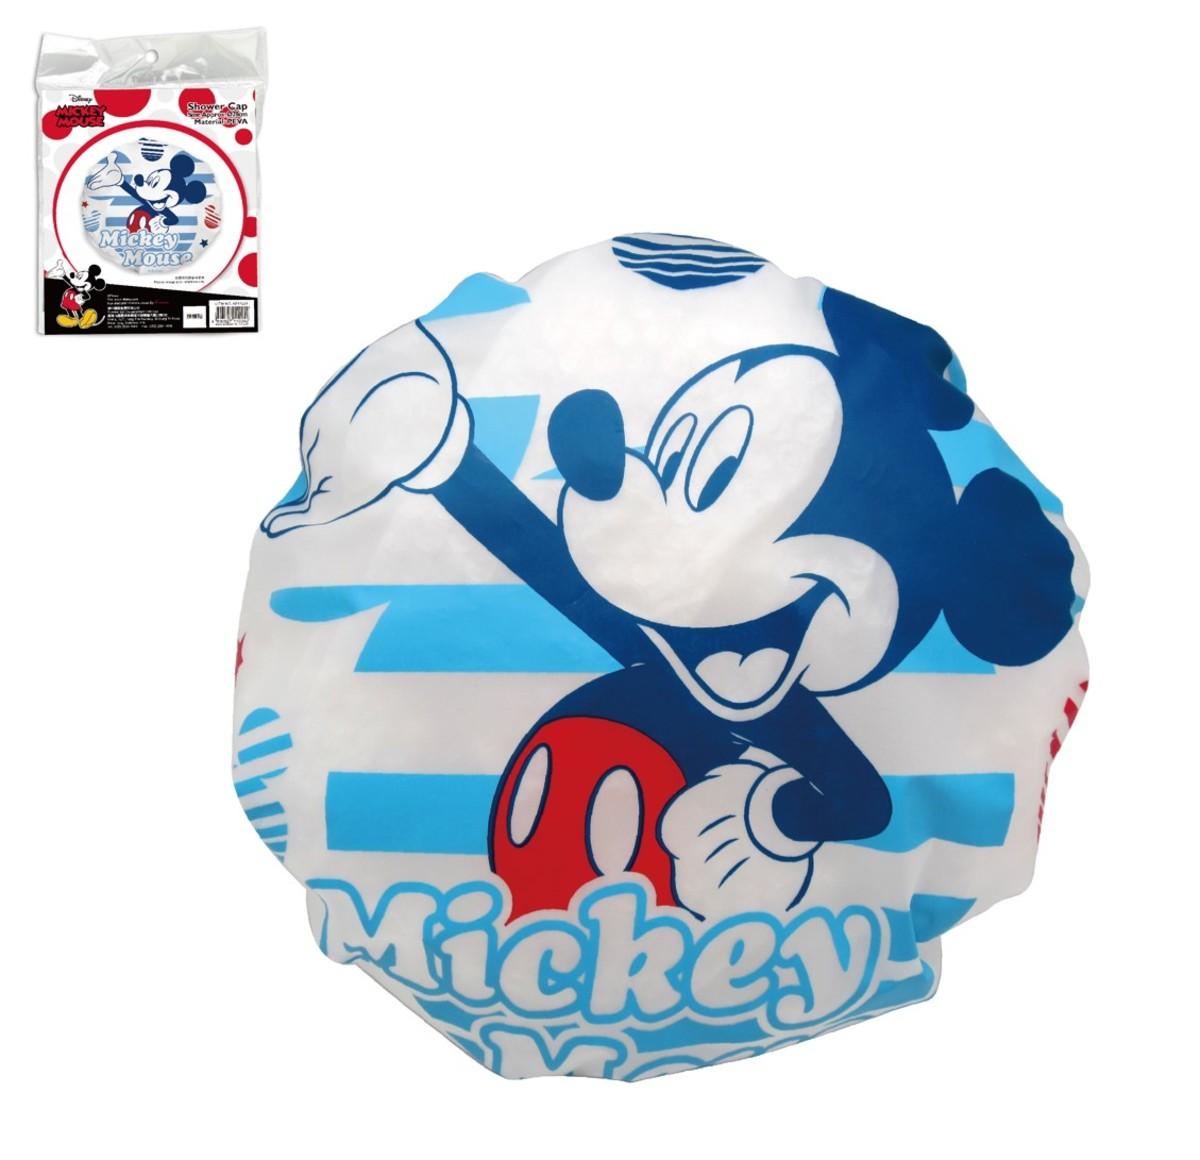 Shower cap C (Licensed by Disney)